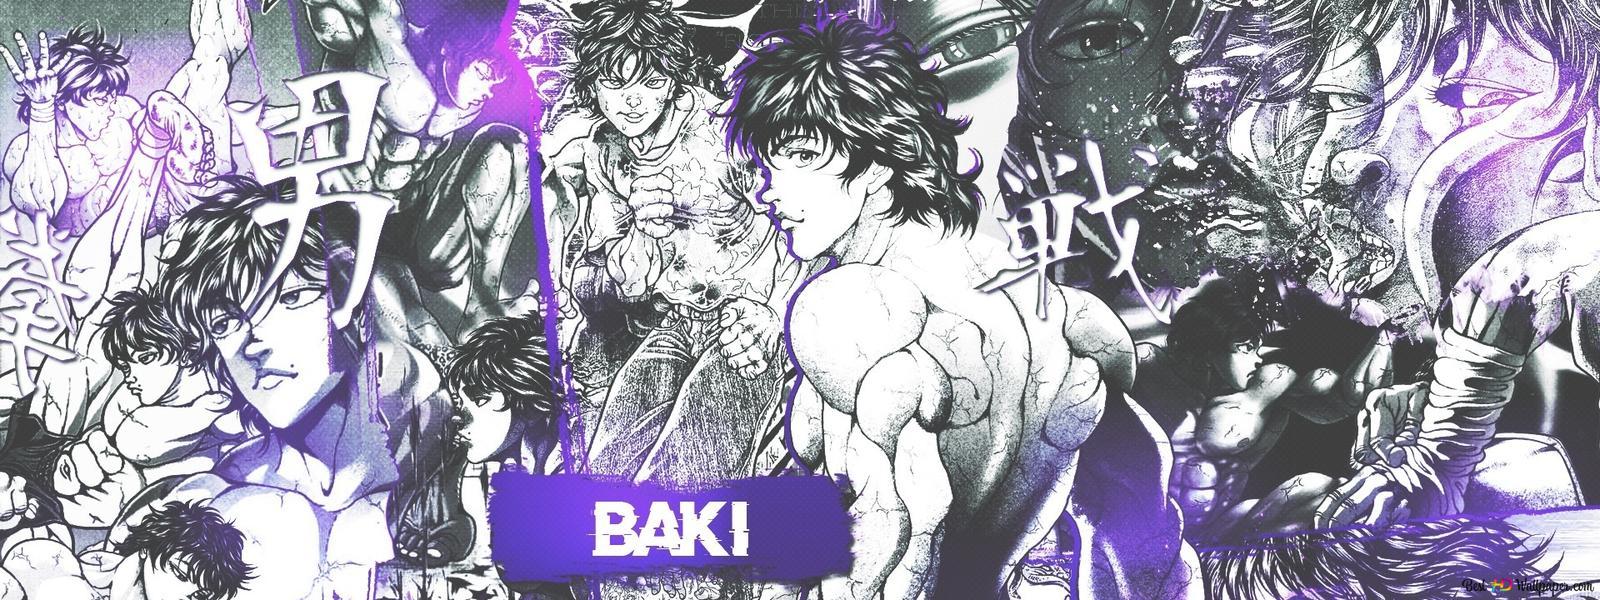 Baki 2018 Hd Wallpaper Download